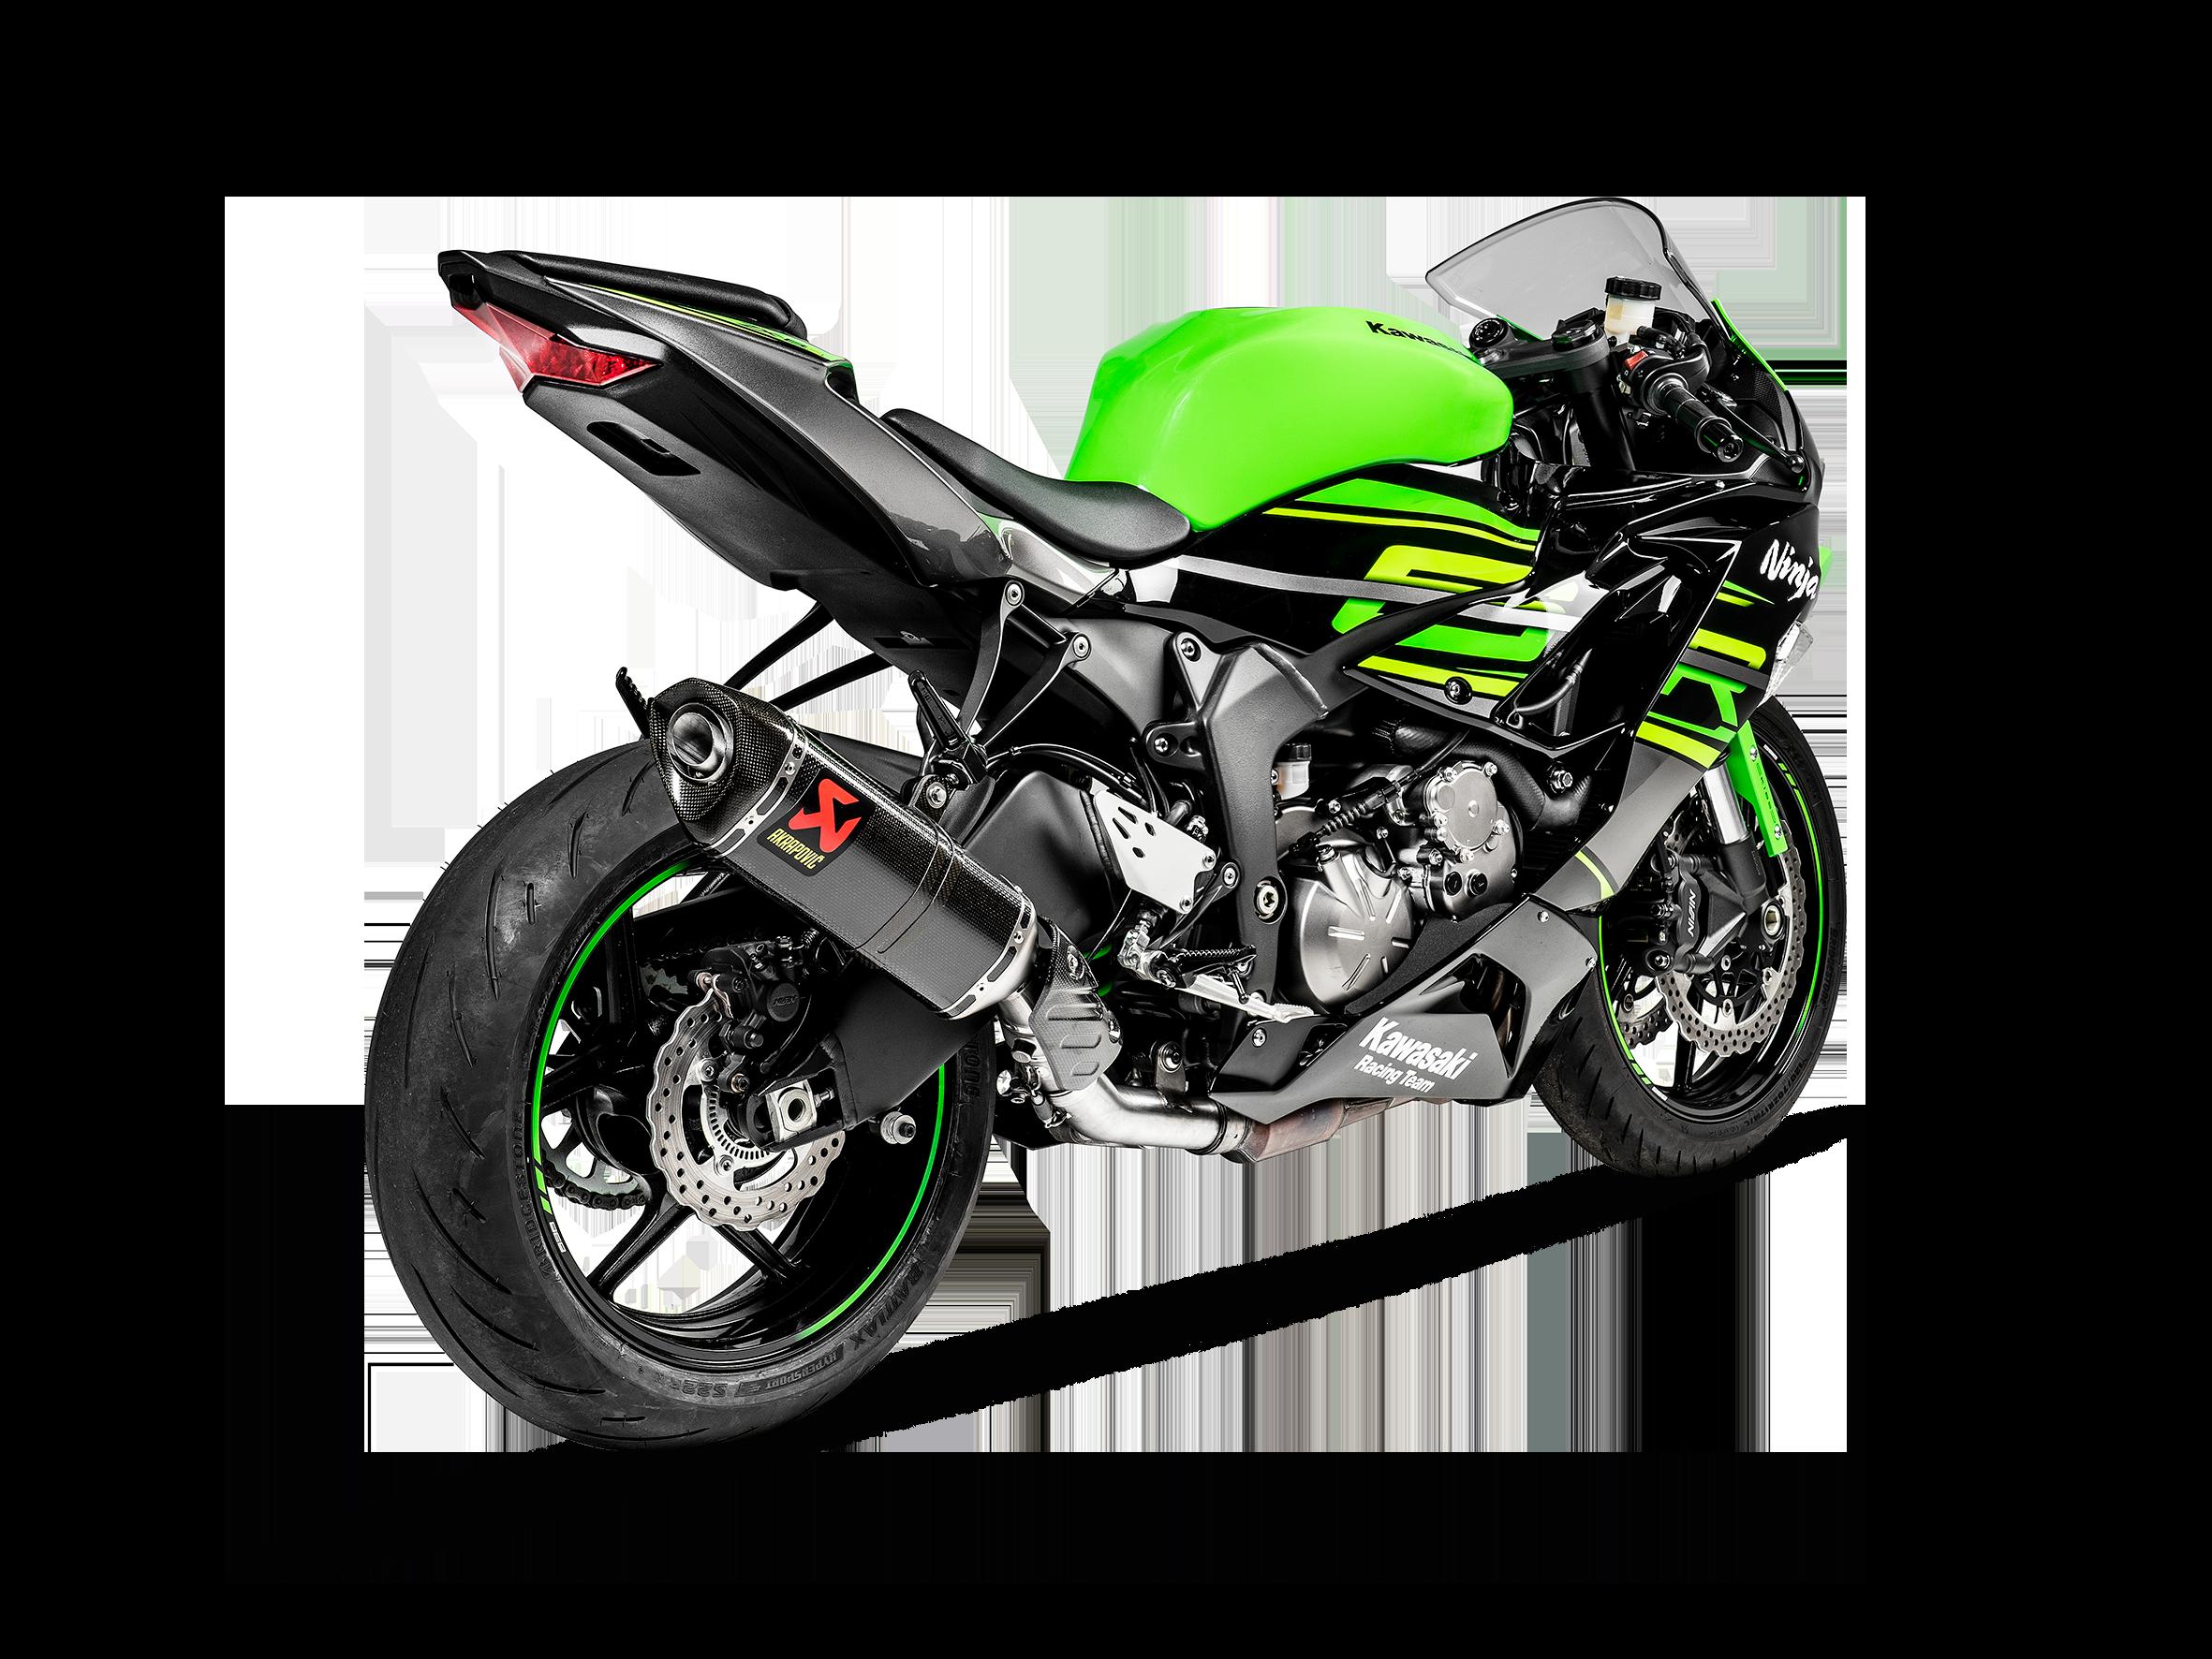 Kawasaki Ninja Zx 6r 636 2020 Optional Link Pipe Ss Akrapovic Motorcycle Exhaust